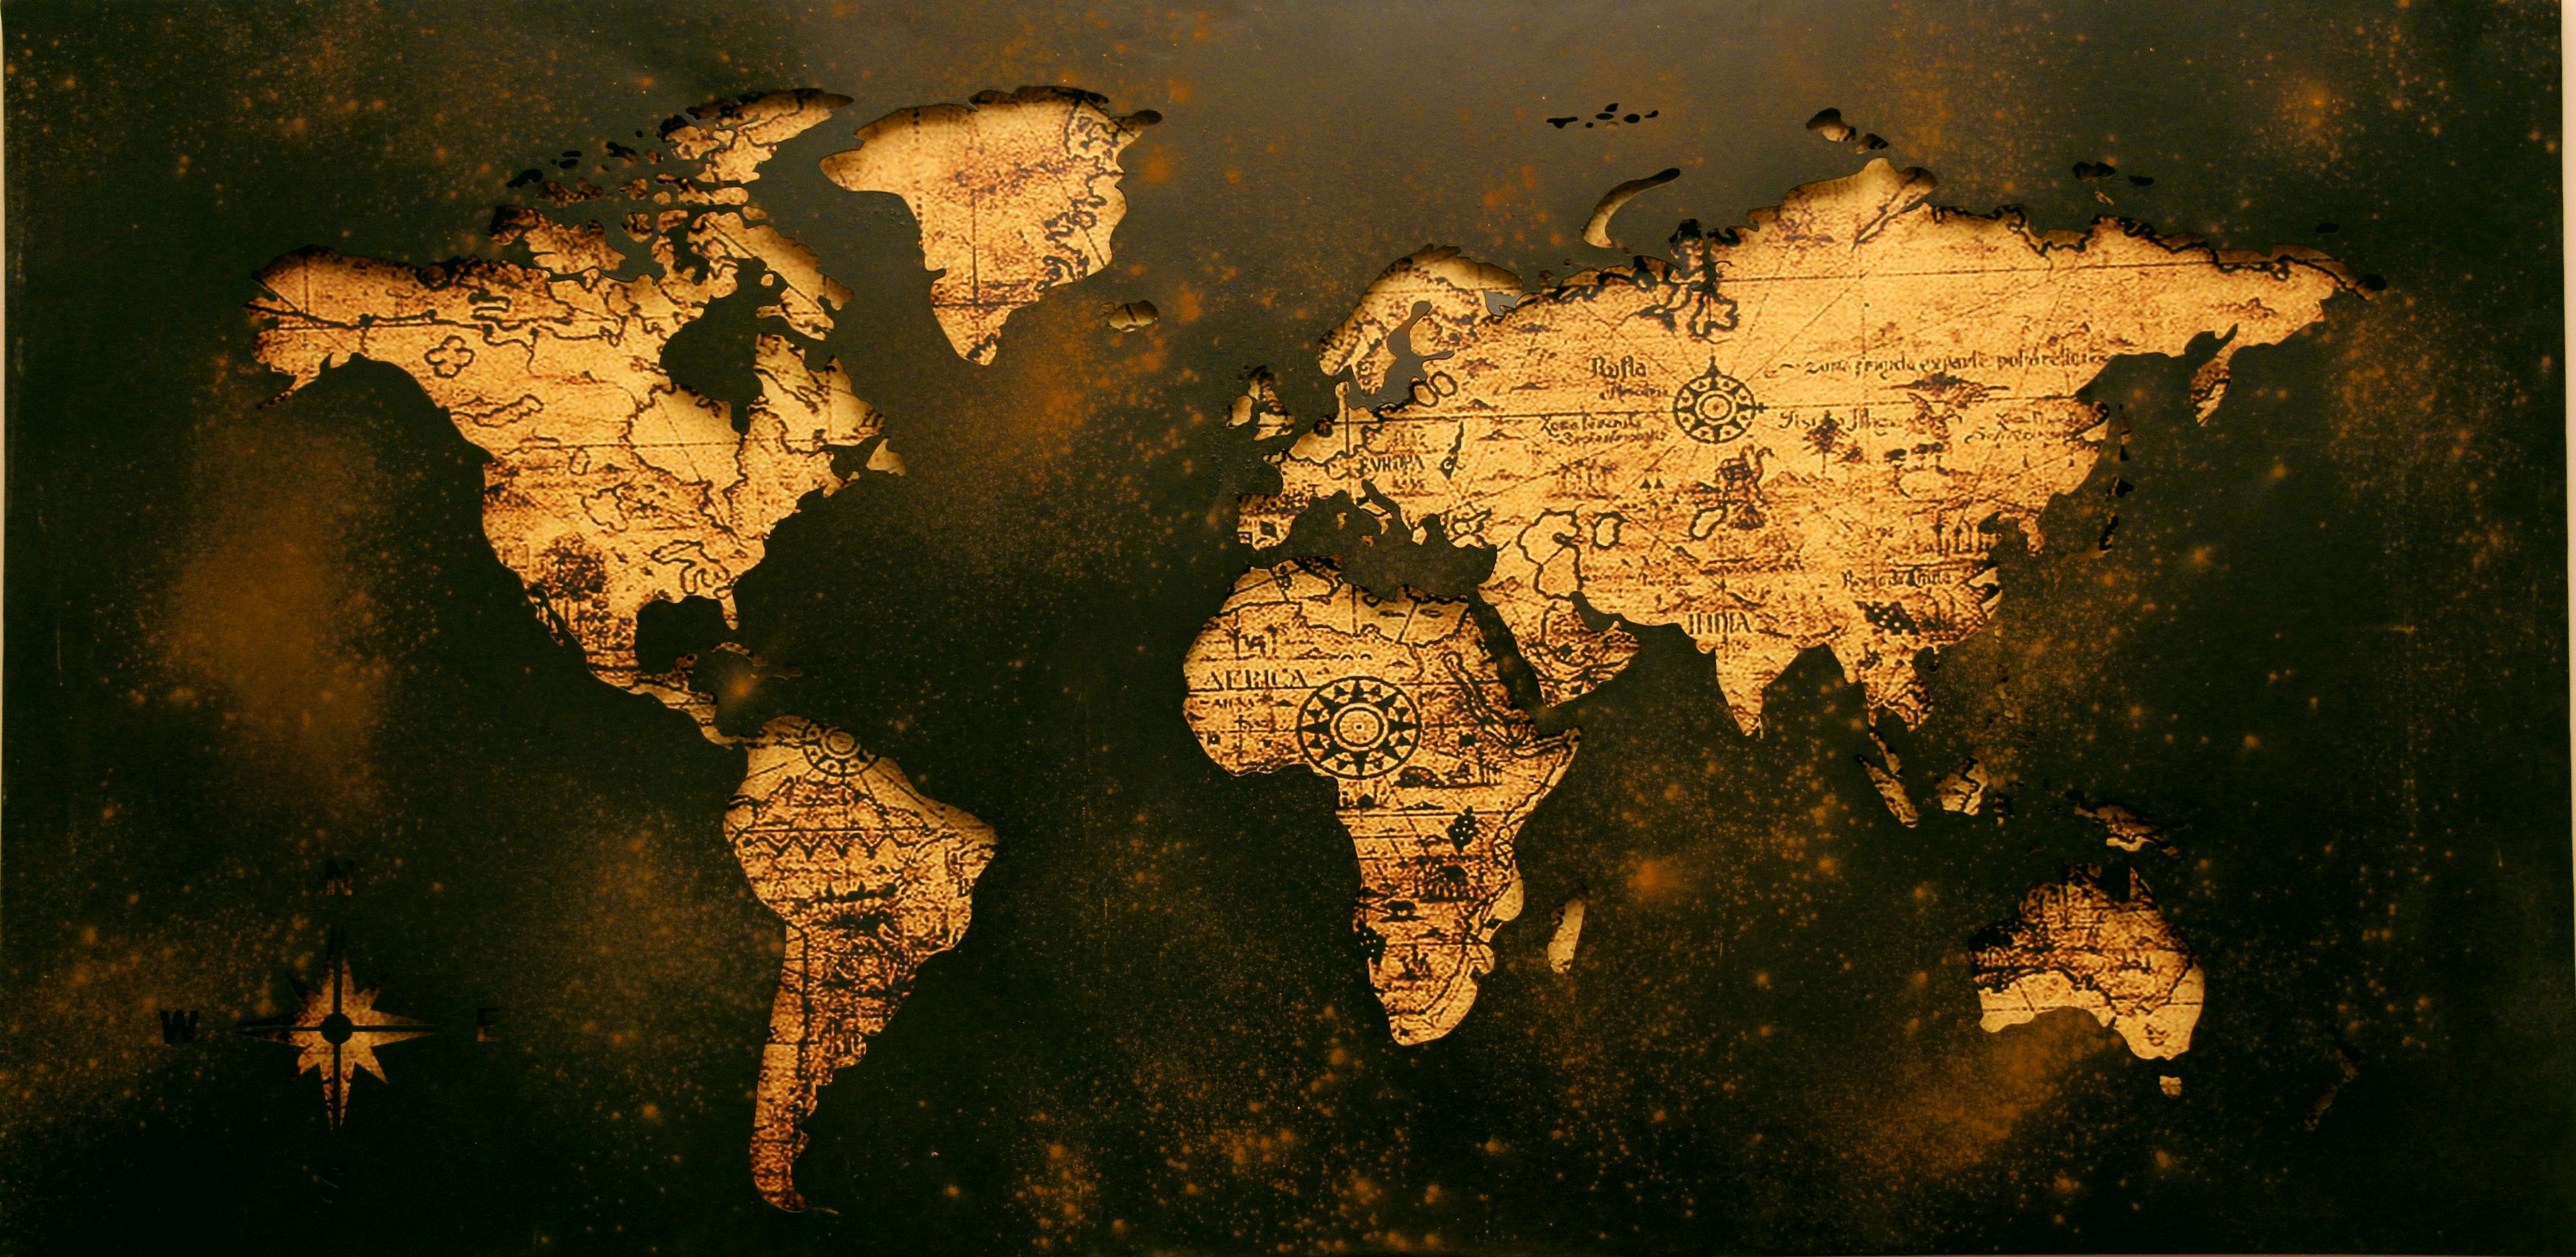 World Map Illustration · Free Stock Photo